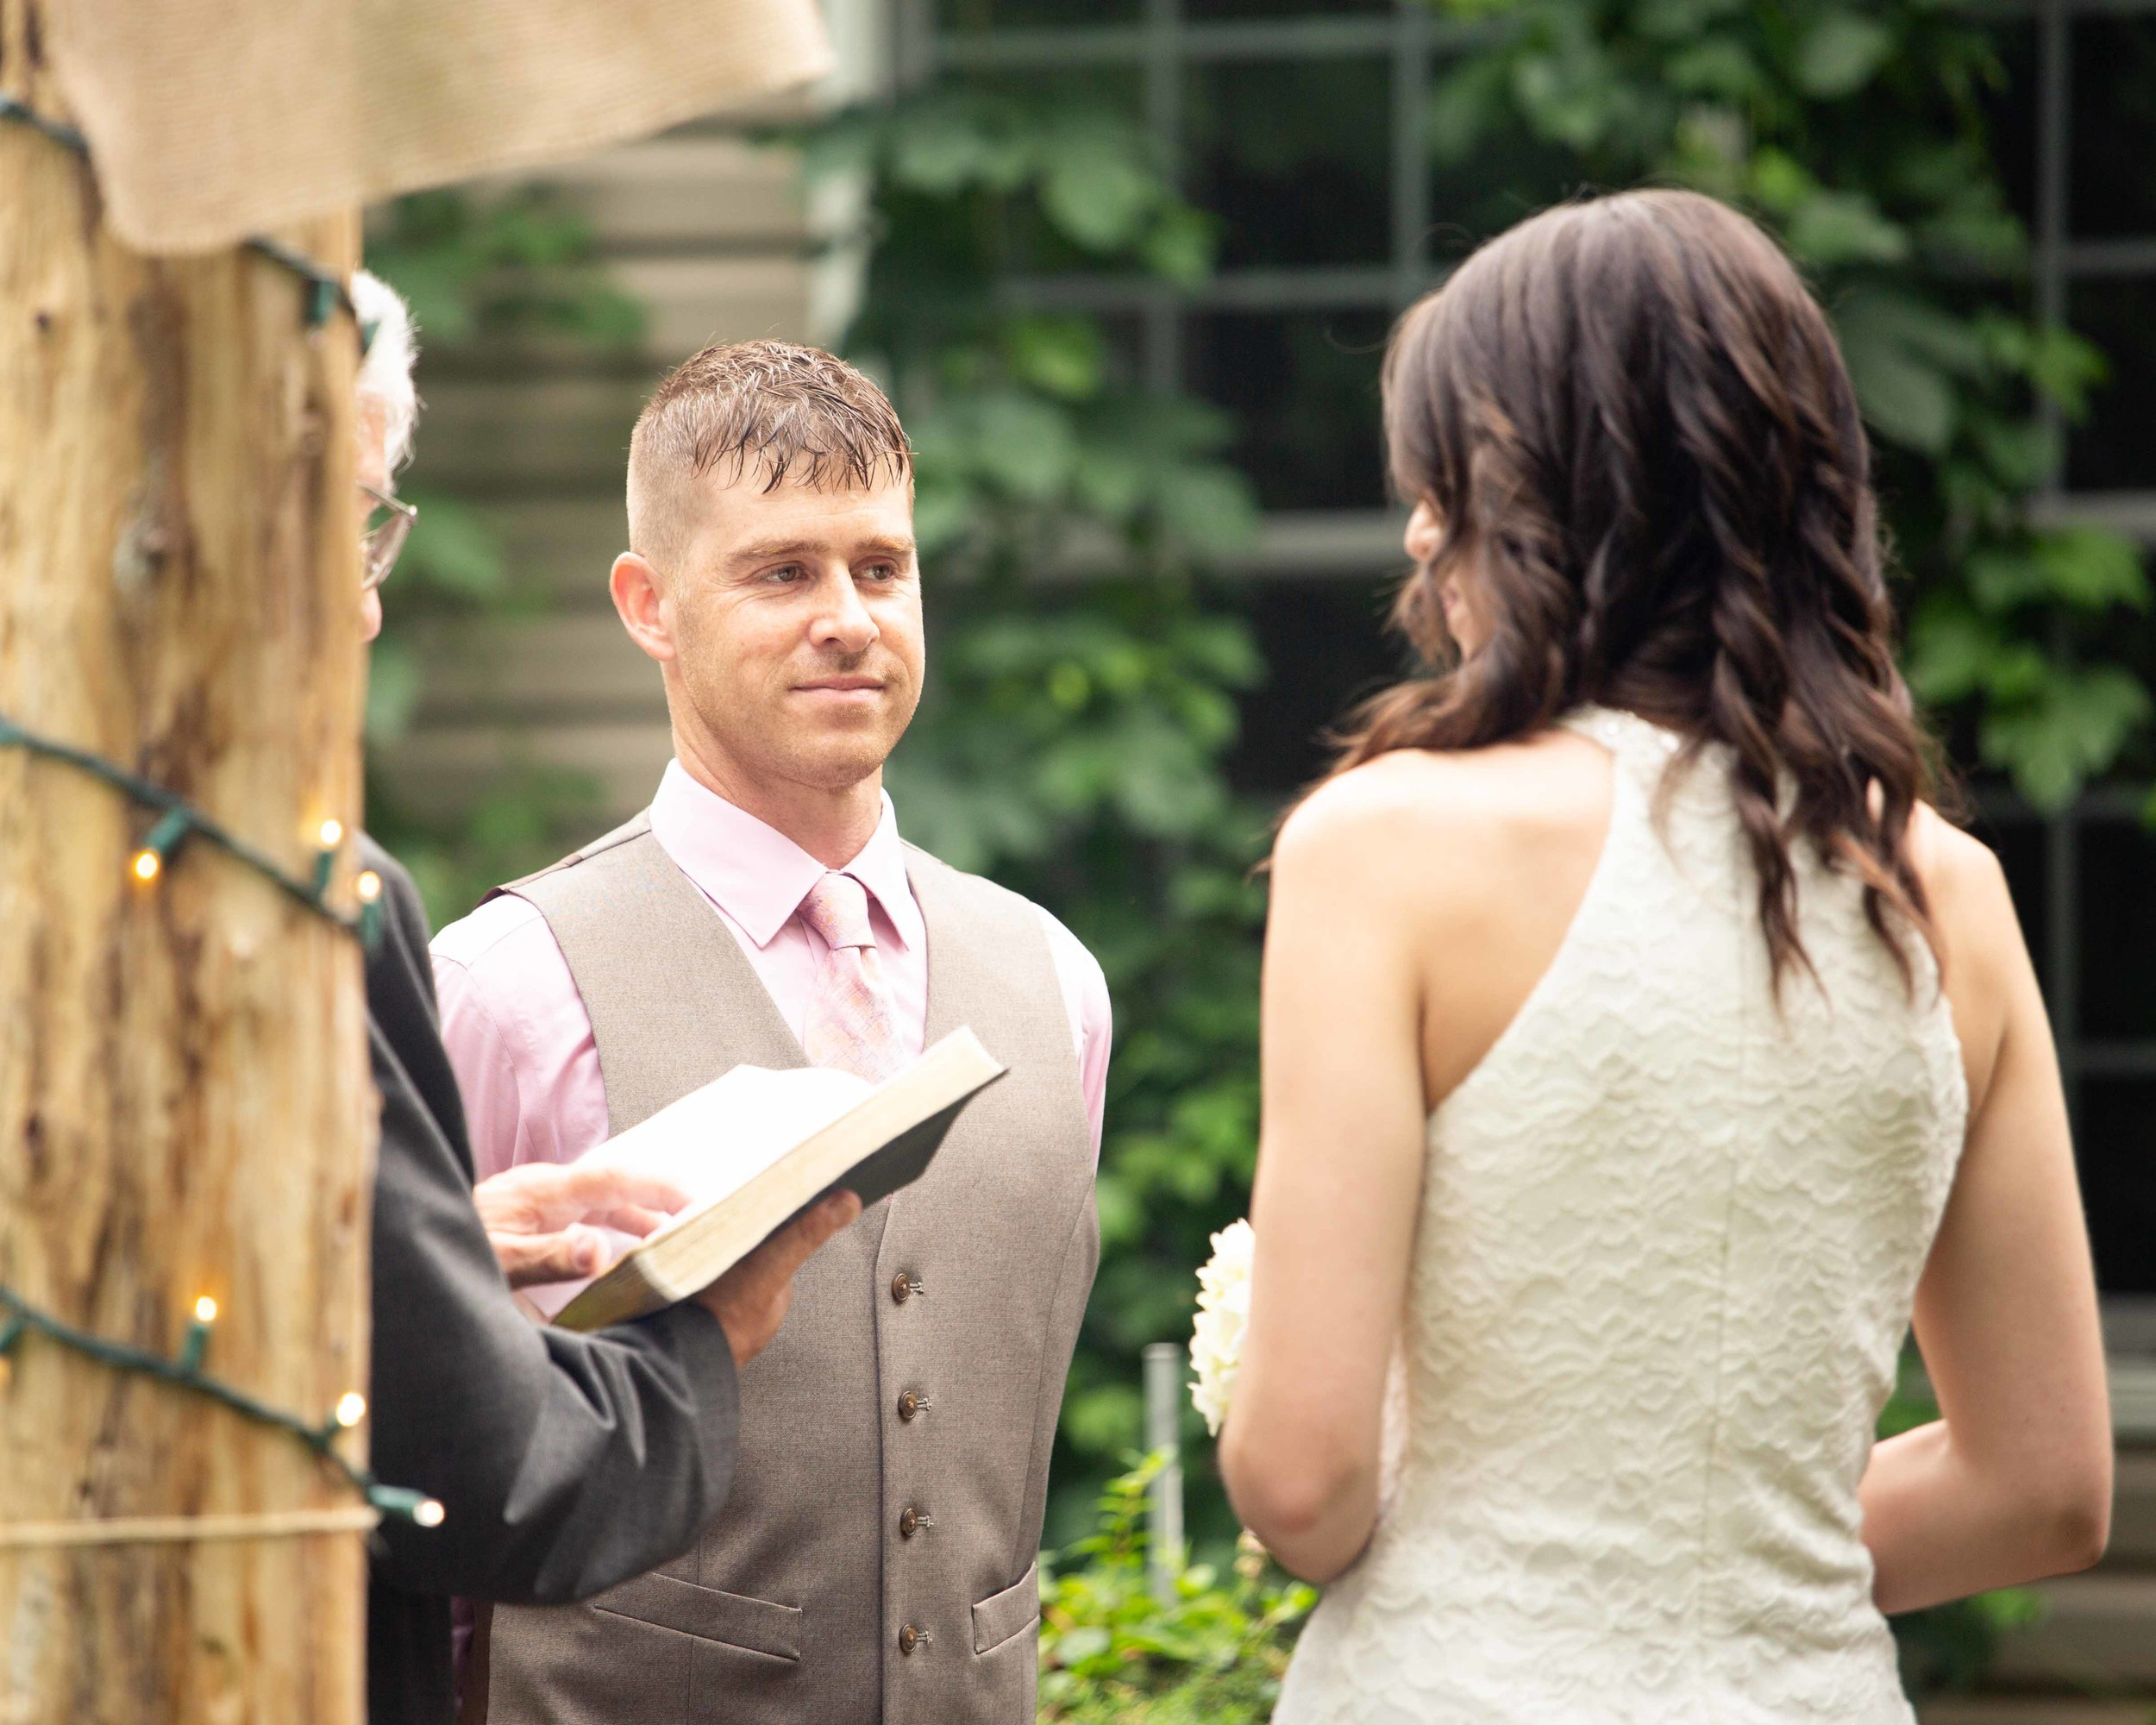 Vow Renewal, Wedding Photography-11.jpg